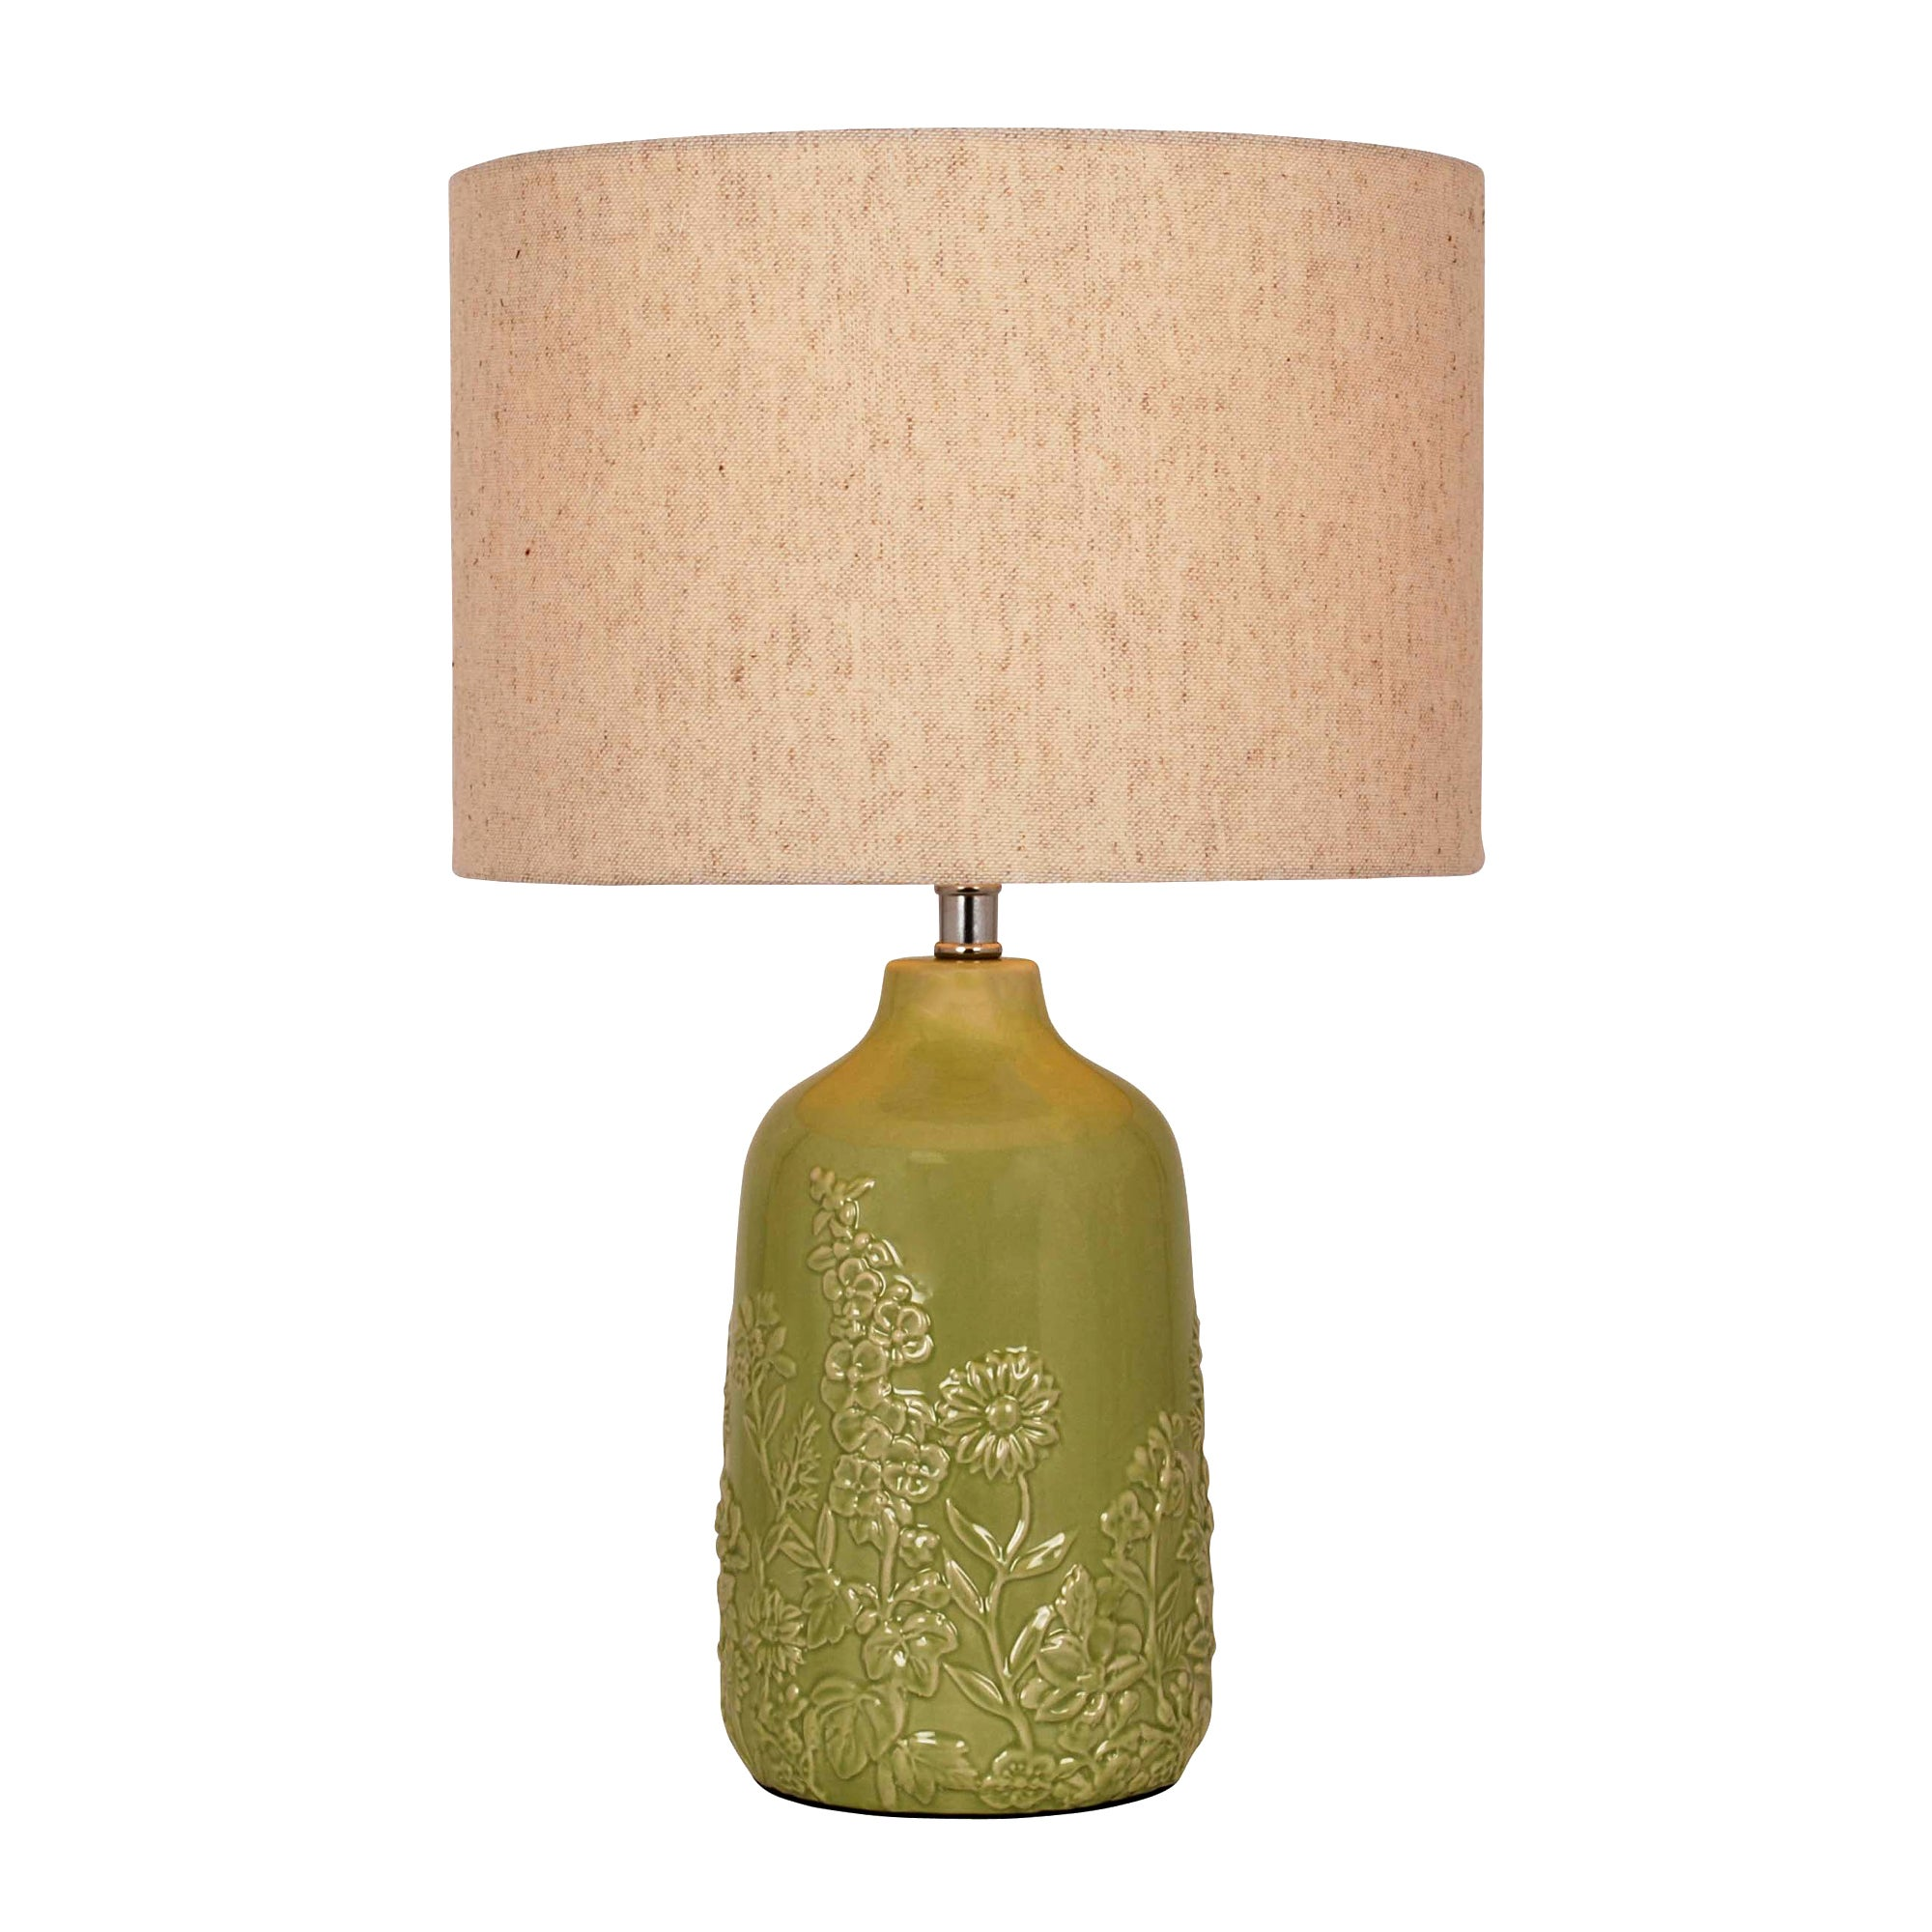 Meadow Embossed Bottle Table Lamp